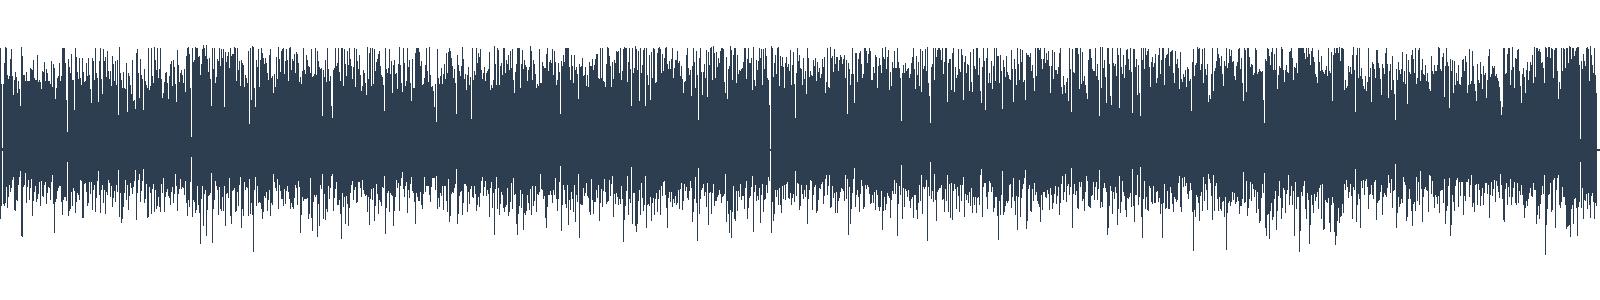 Dominik Dán - Nehanebné neviniatko waveform